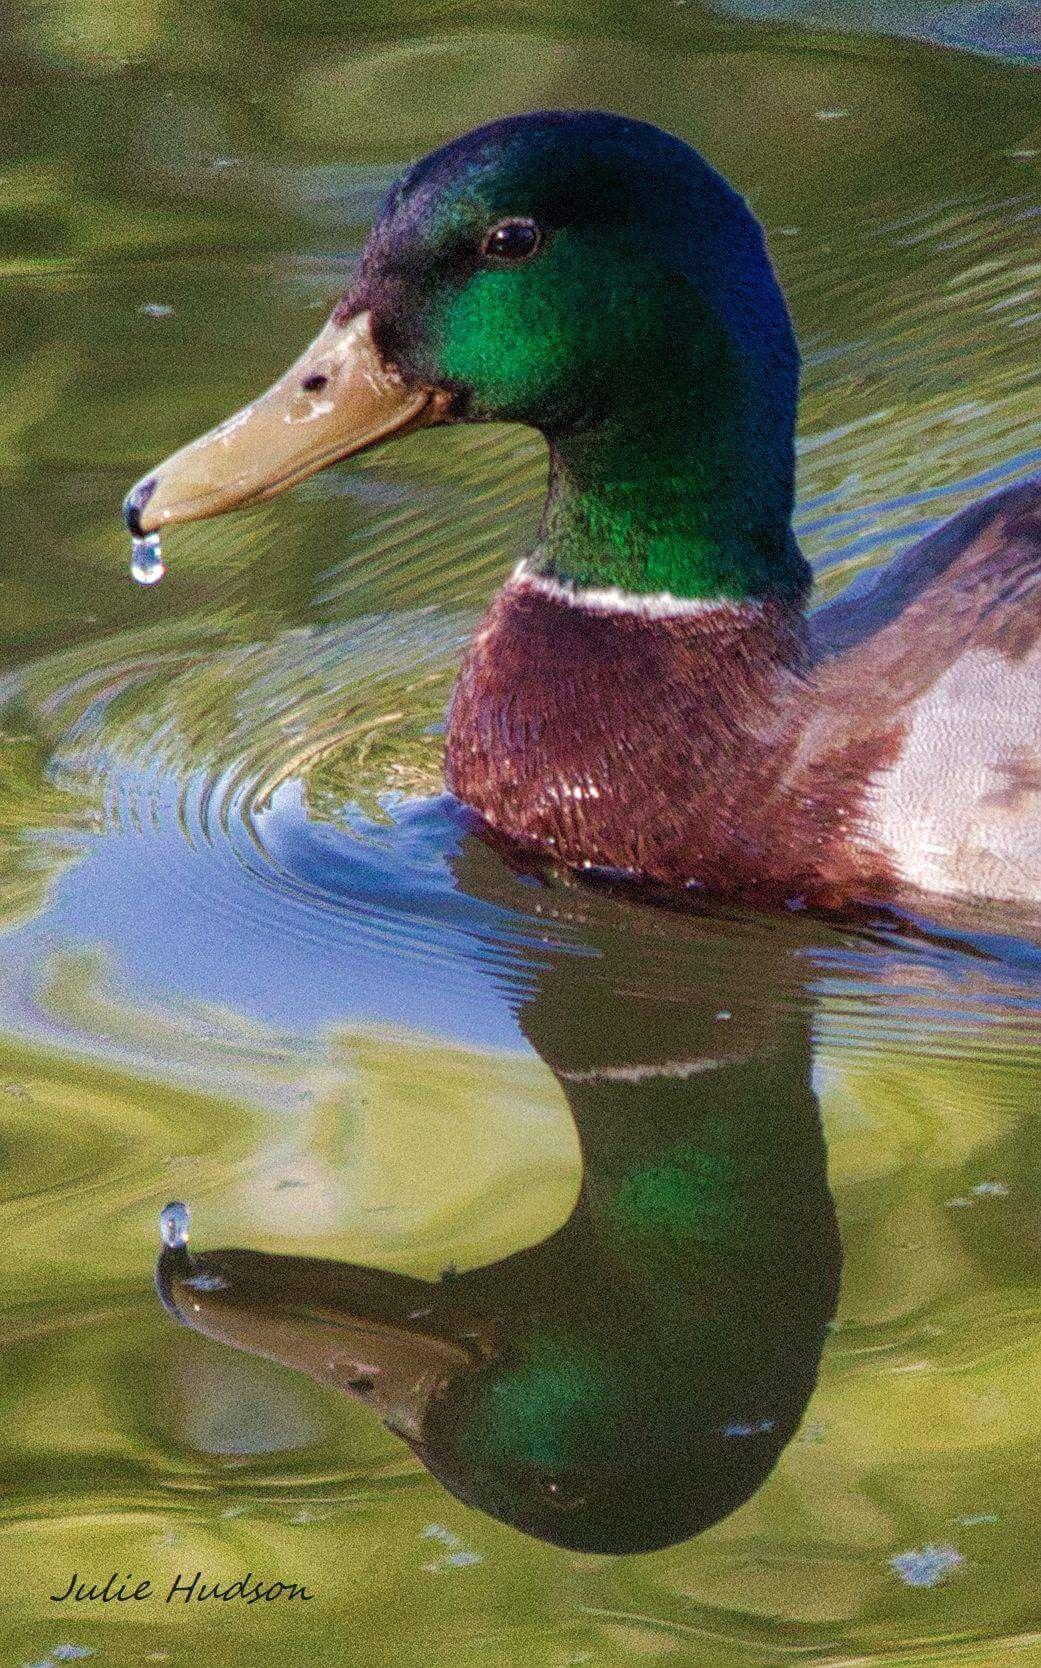 Pin By Batqueen66 On Animals Reptiles Mammals Birds